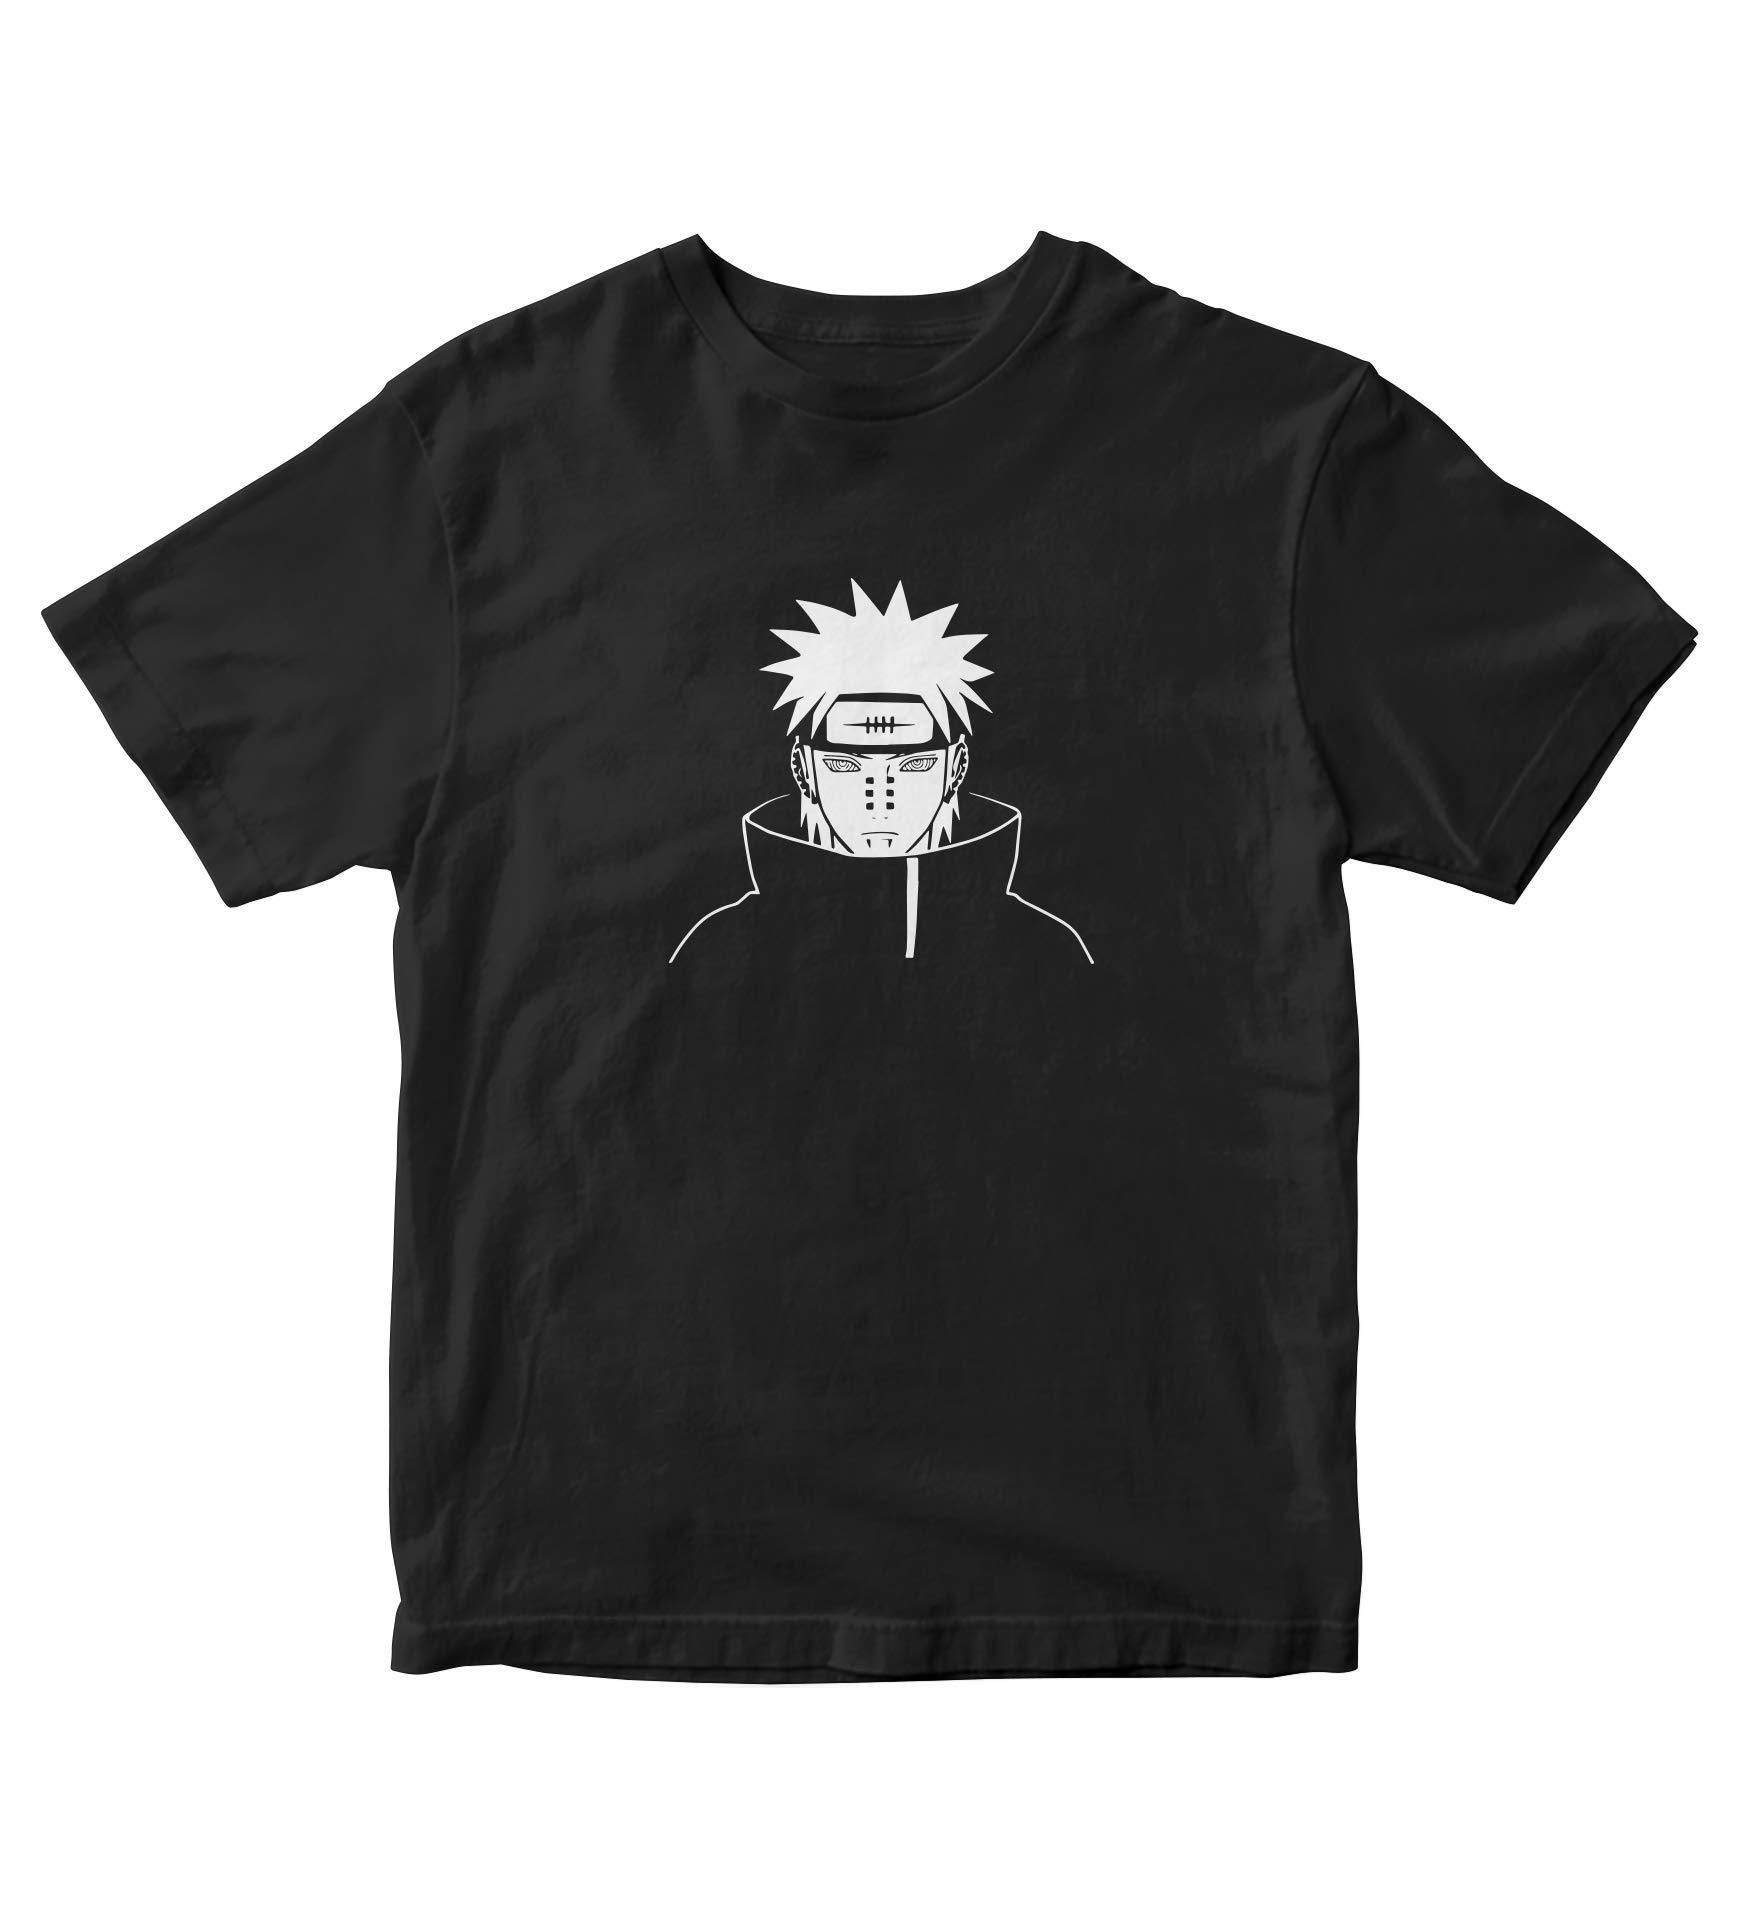 Tjsports Nagato Pain Akatsuki Naruto T Shirt Adult S Anime Manga A695